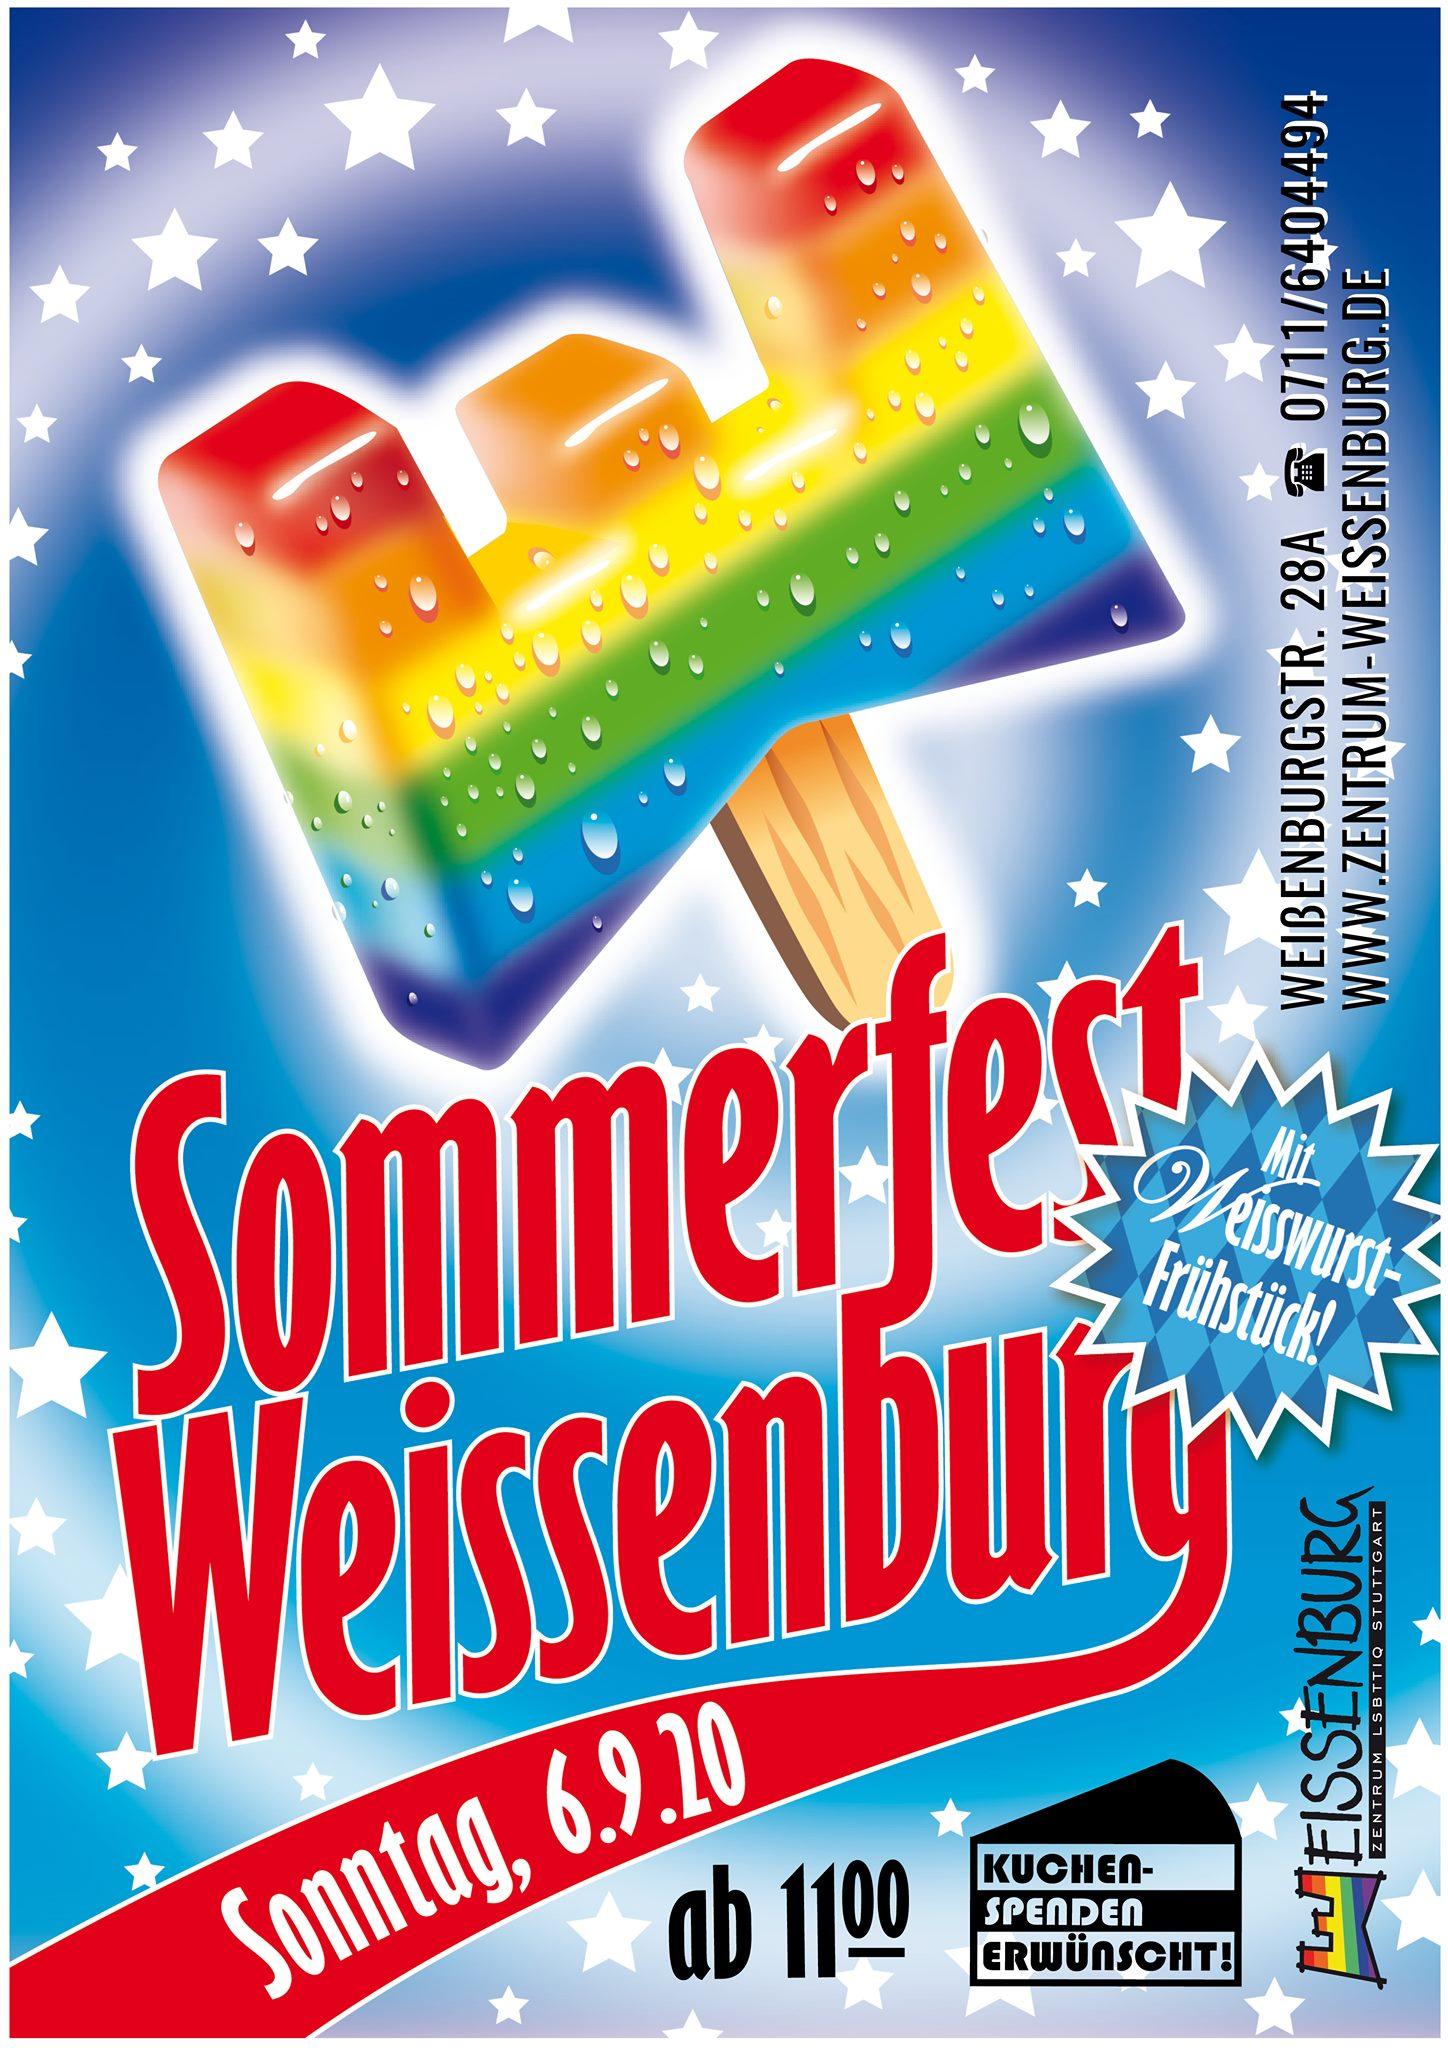 Festival estivo di Weissenburg